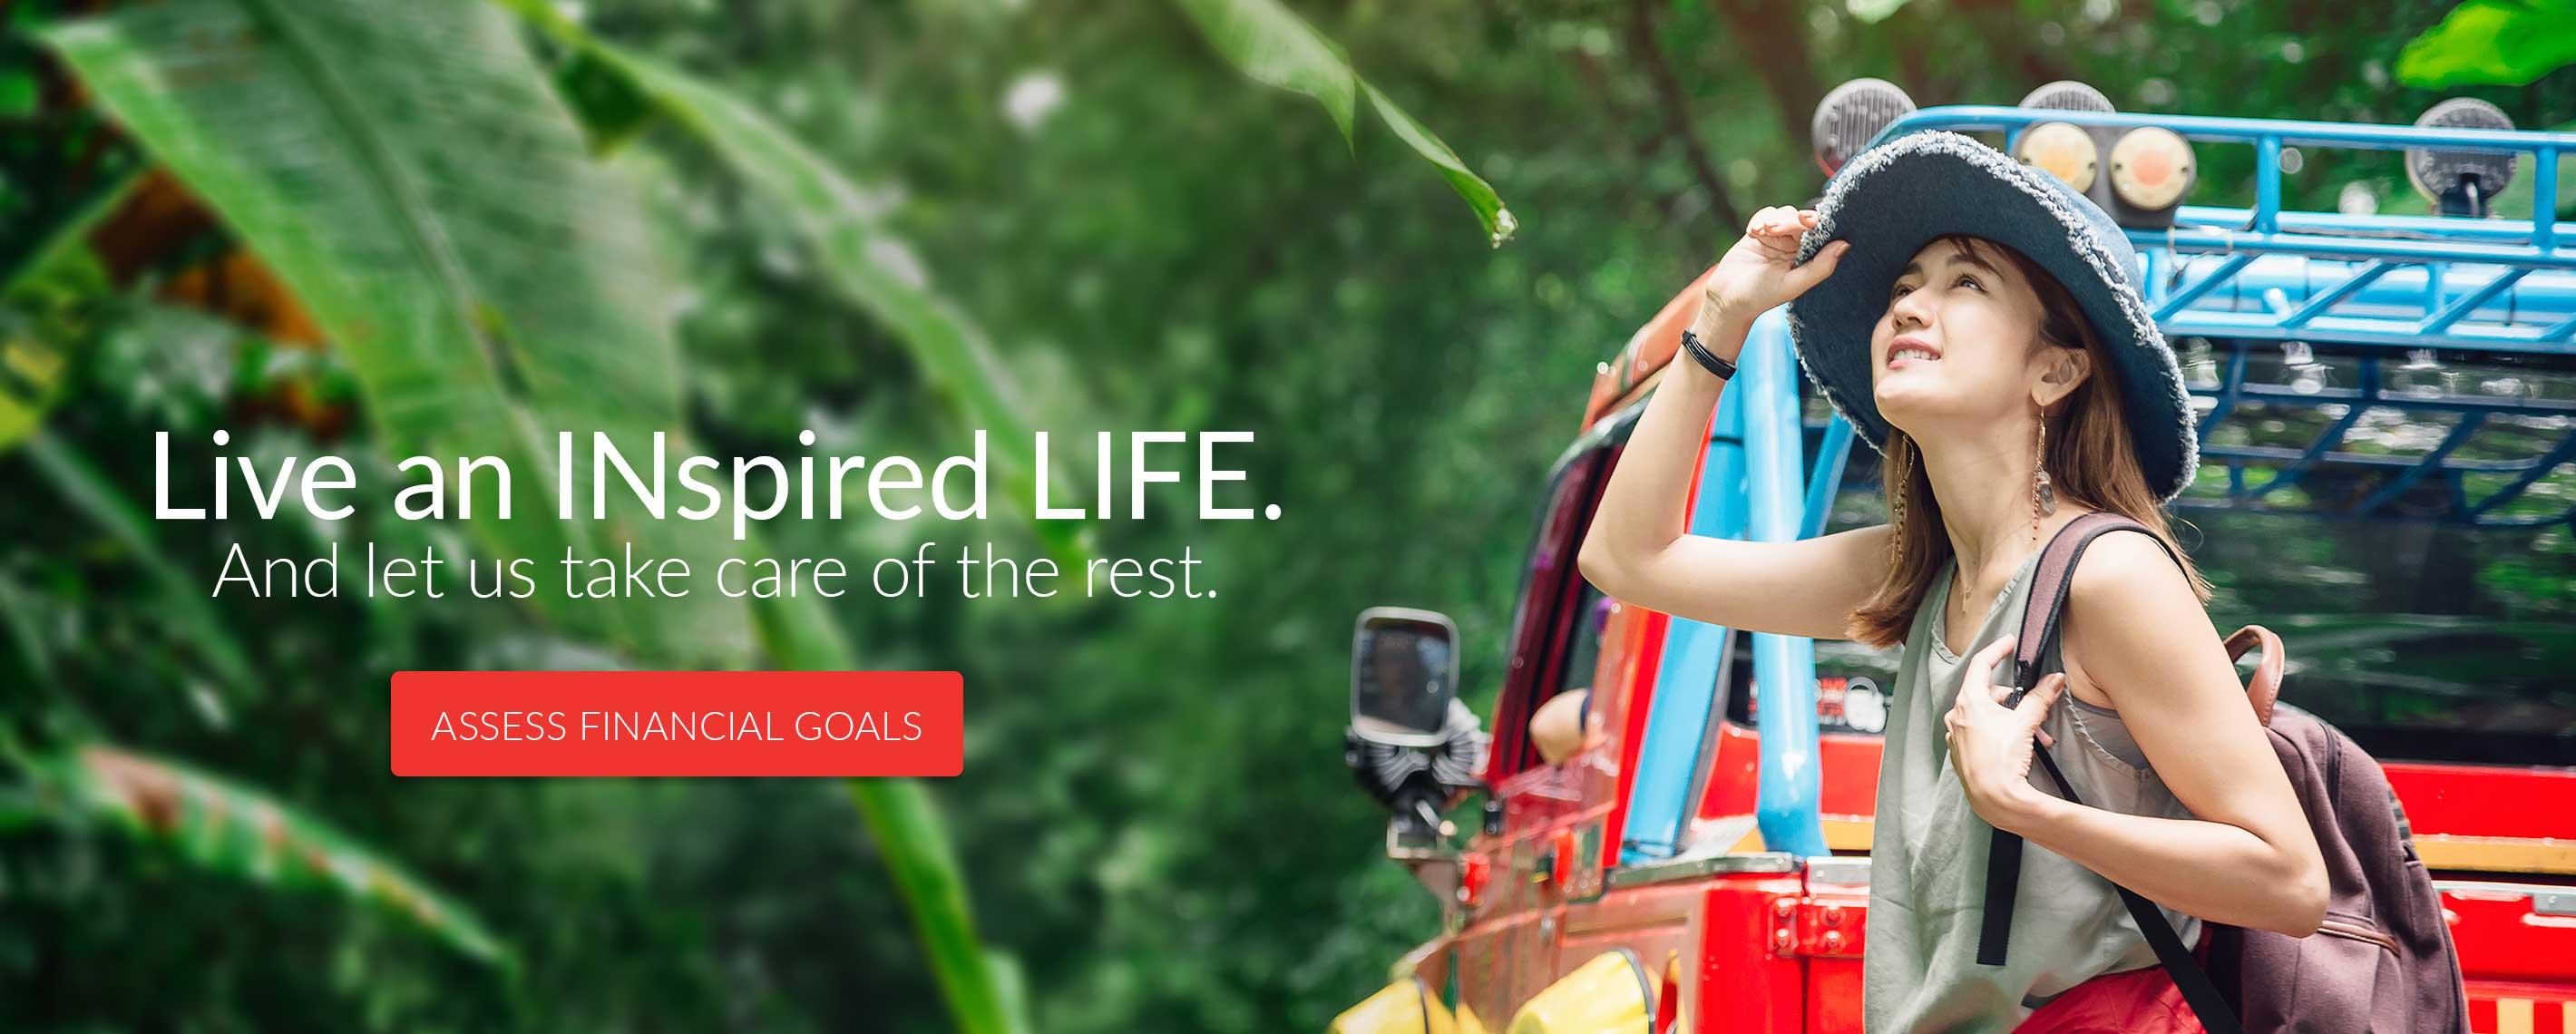 Best Life Insurance Company >> Insular Life - The Top Life Insurance Investment Company in the Philippines